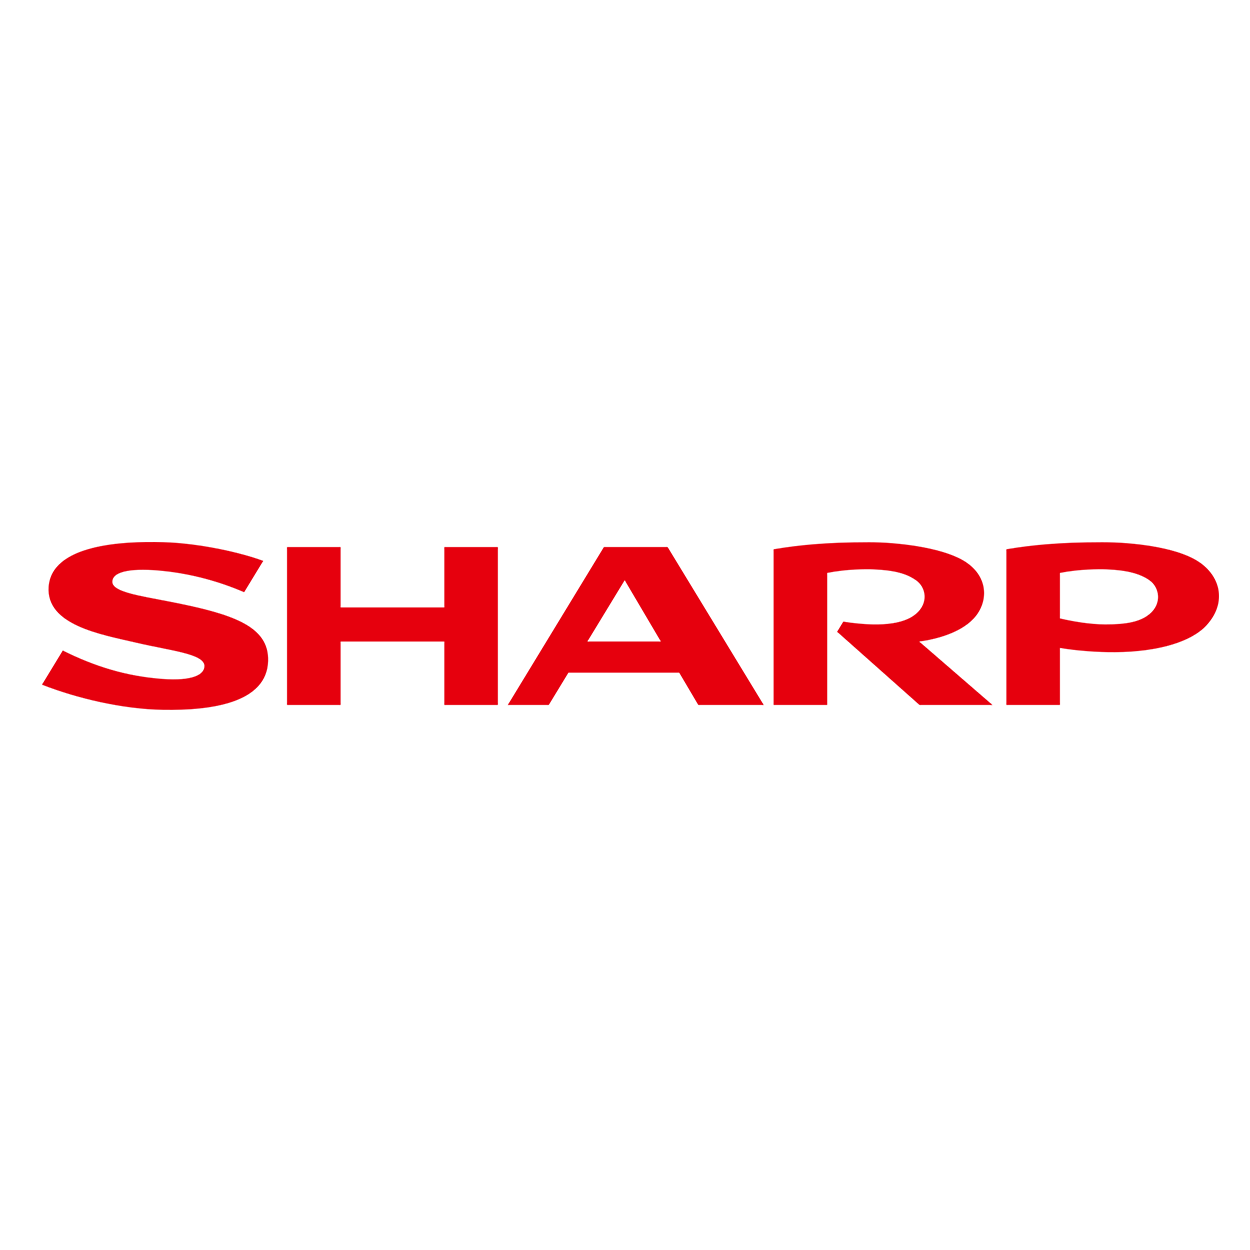 sharp.png